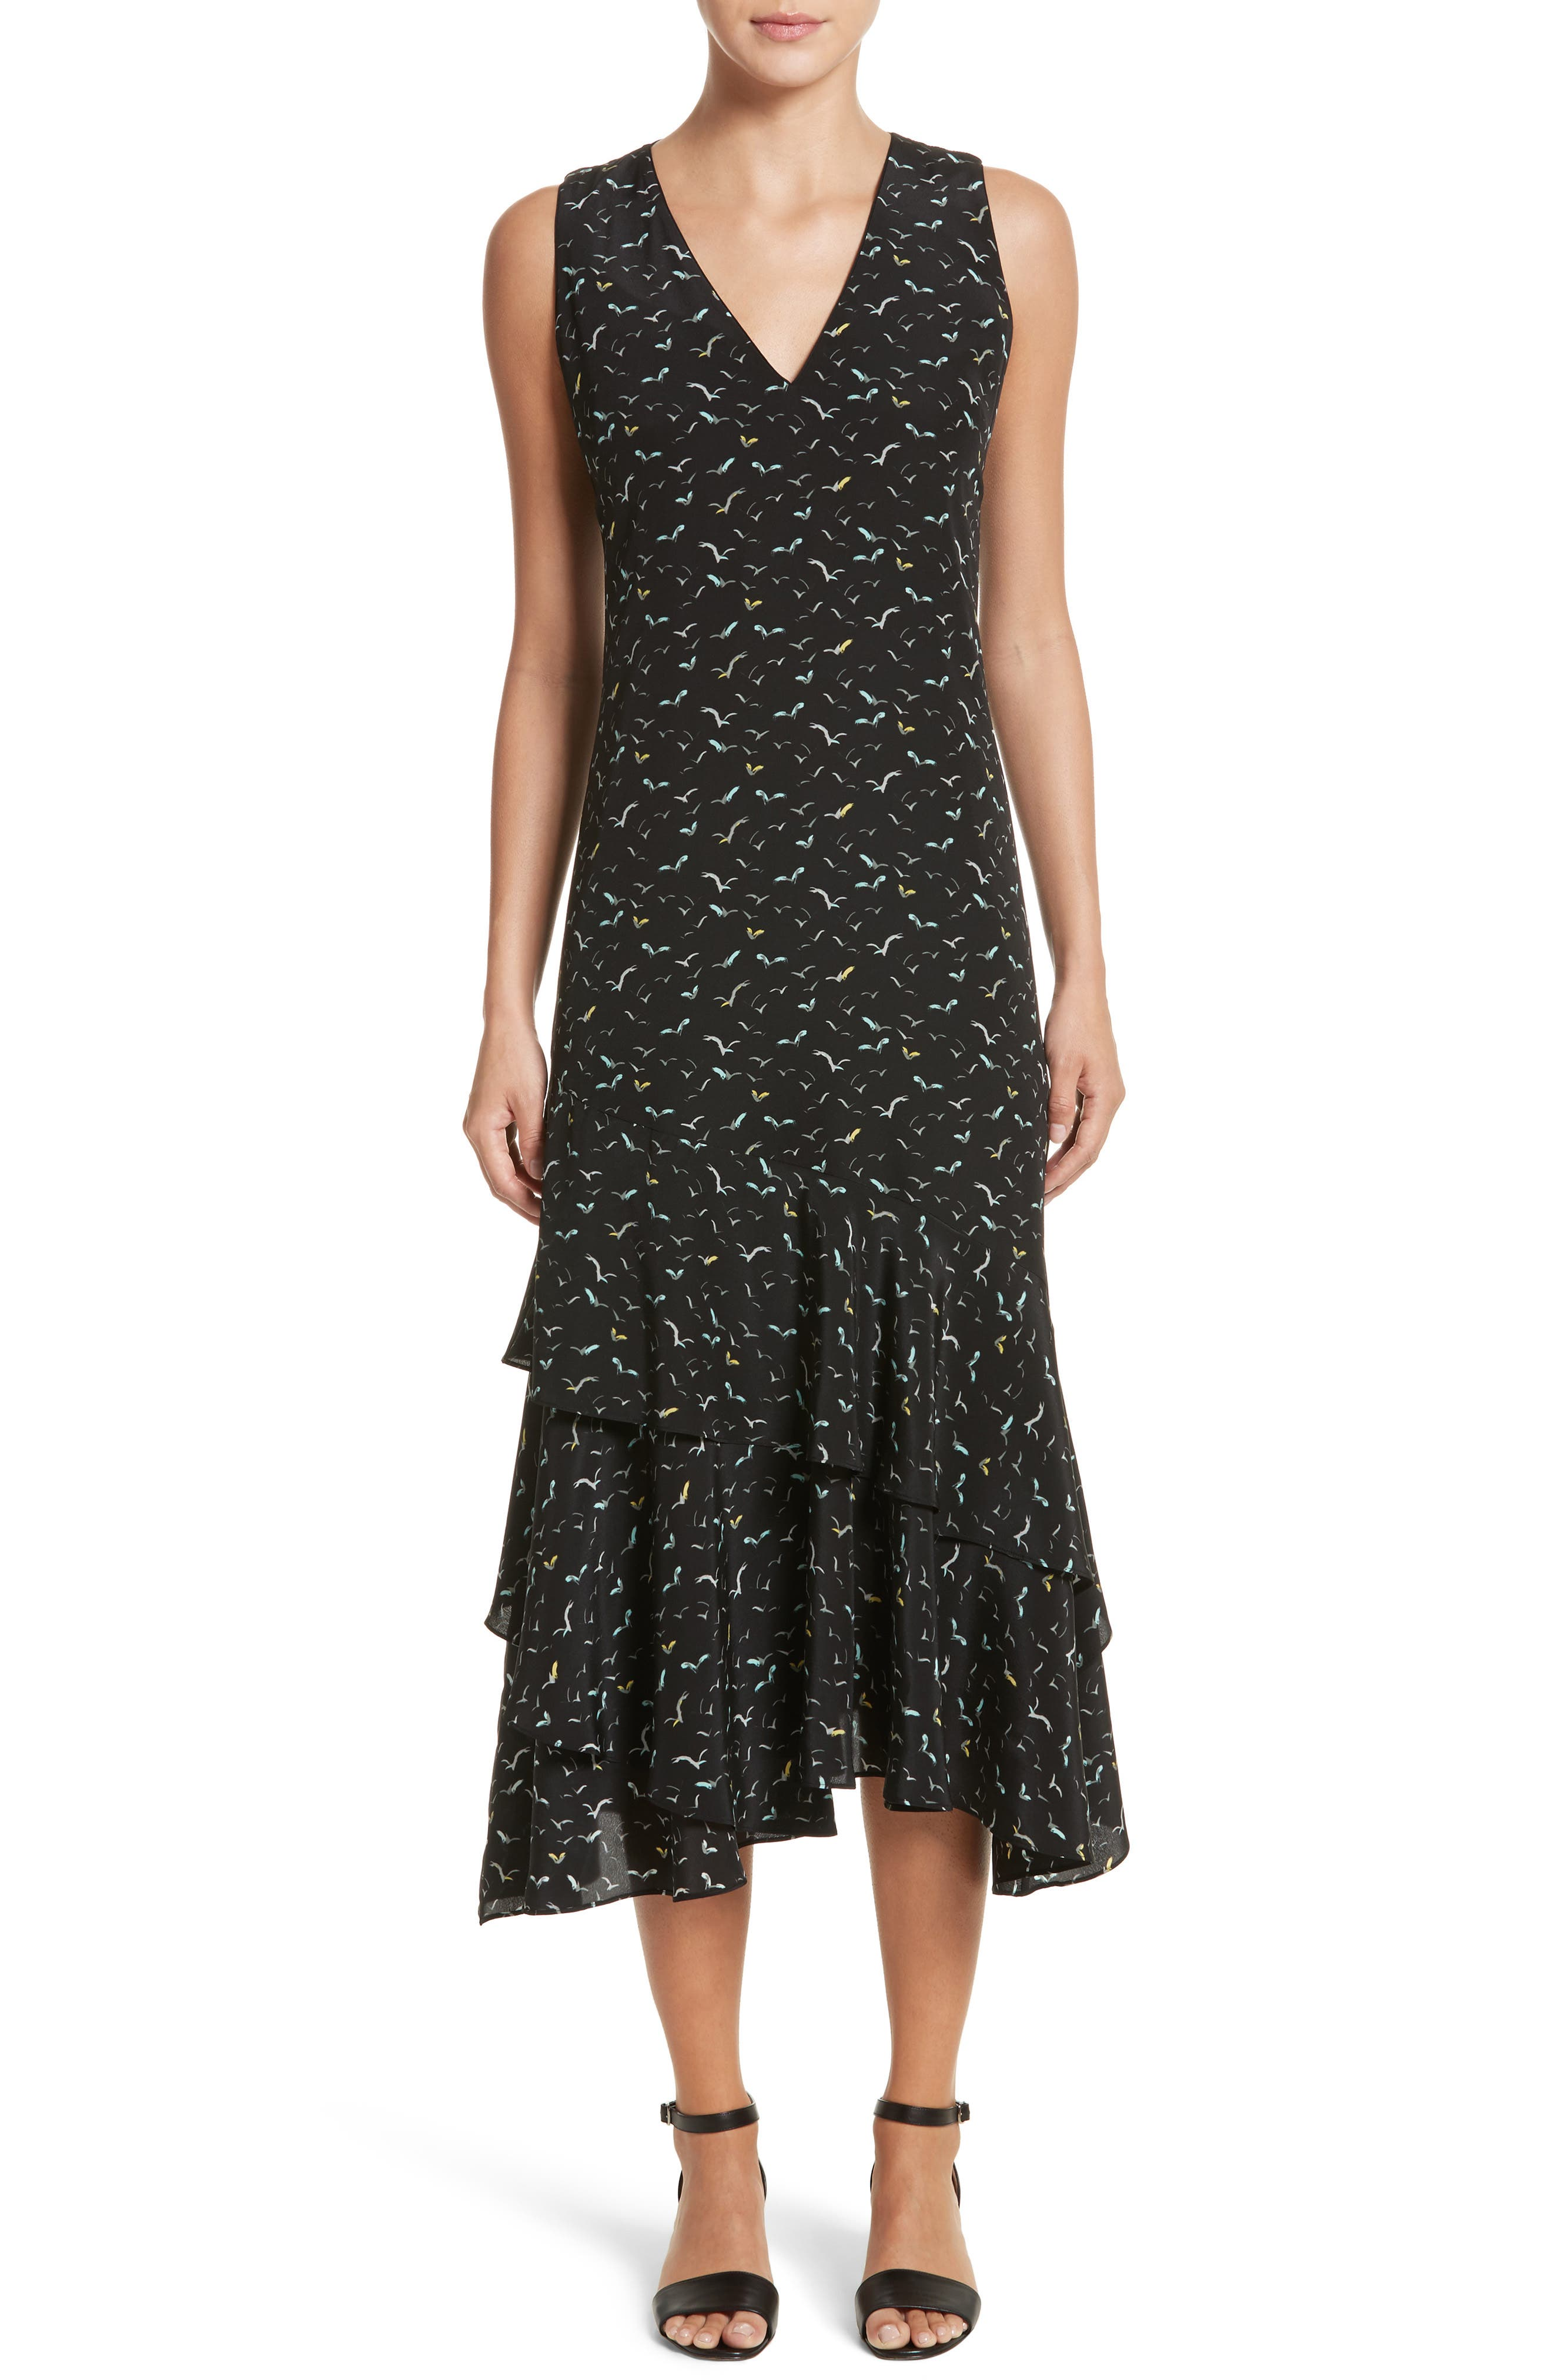 Taurina Tiered Silk Dress,                         Main,                         color, Black Multi